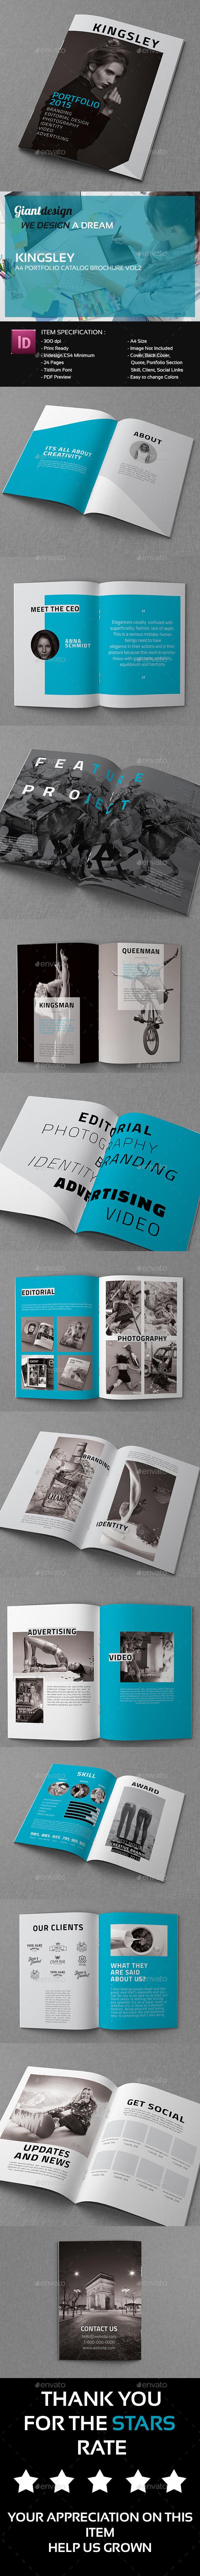 Kingsley - A4 Portfolio Catalog Brochure Vol 2 - Portfolio Brochures